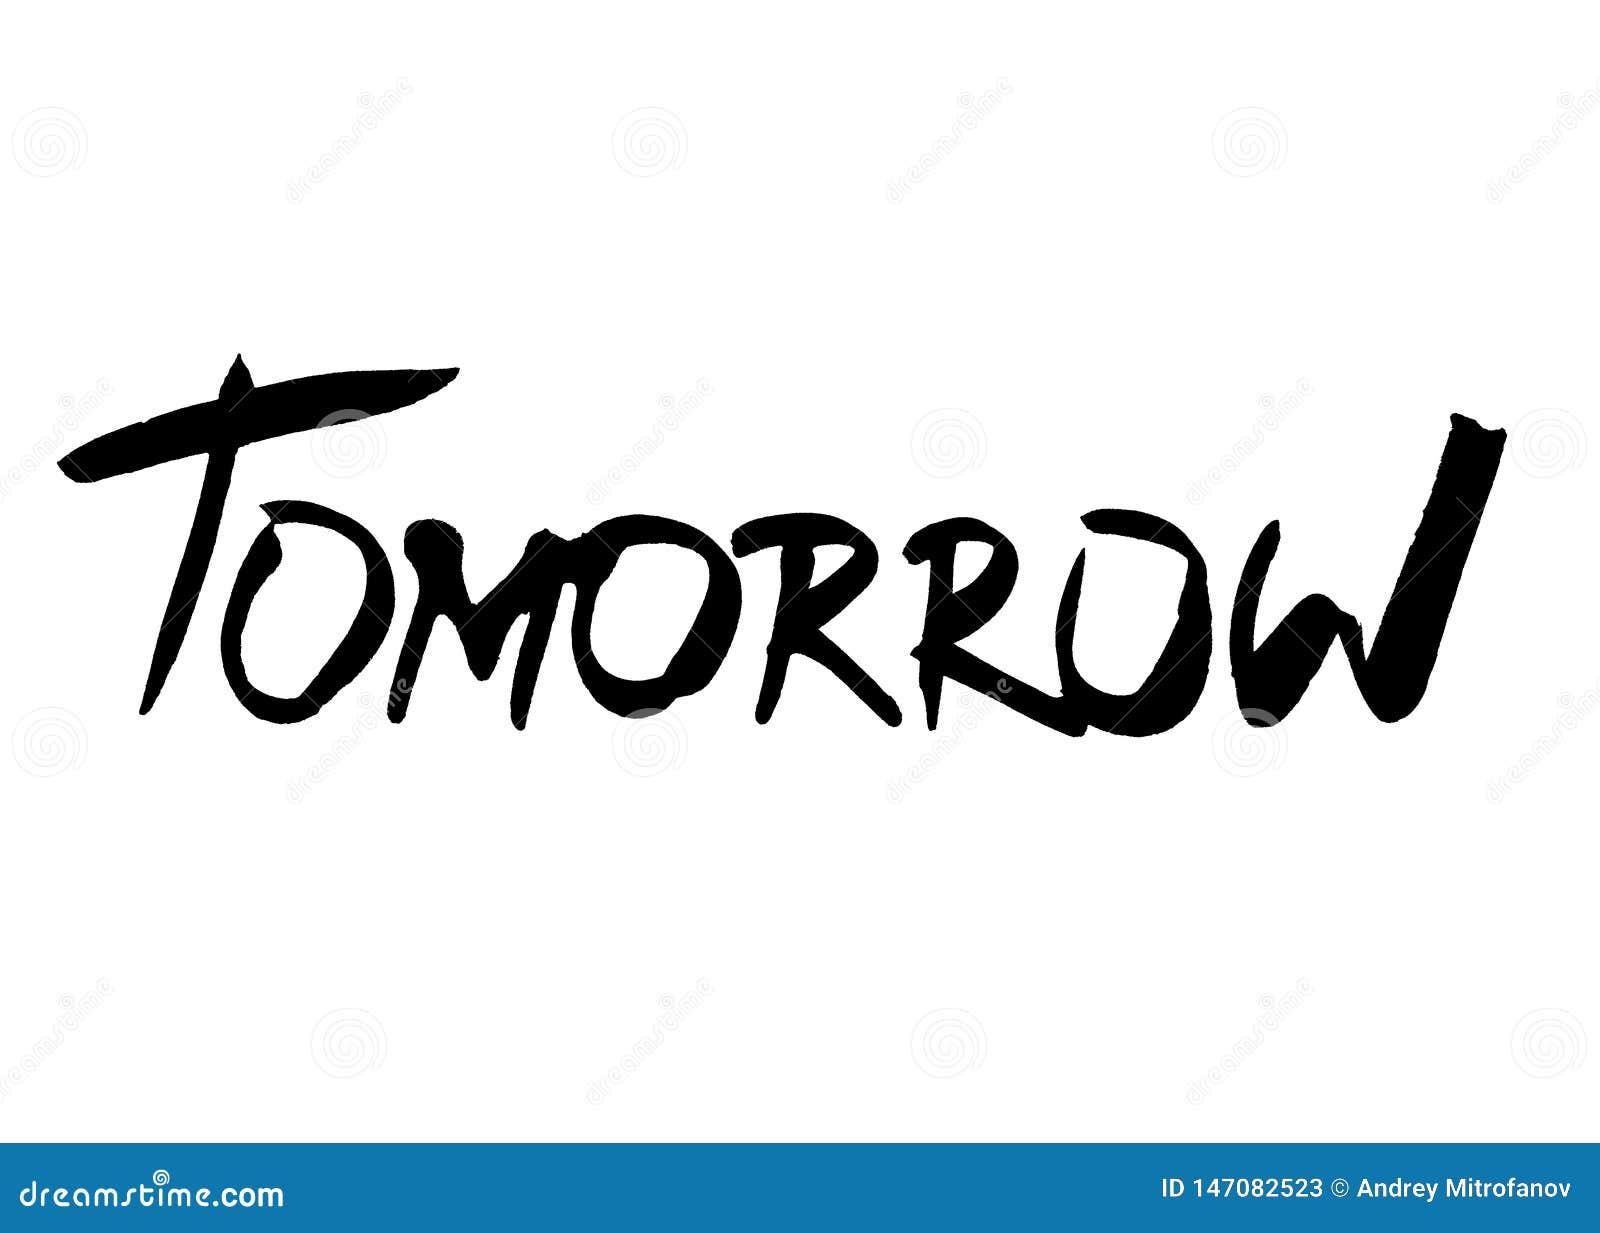 Tomorrow. Hand drawn. The inscription.